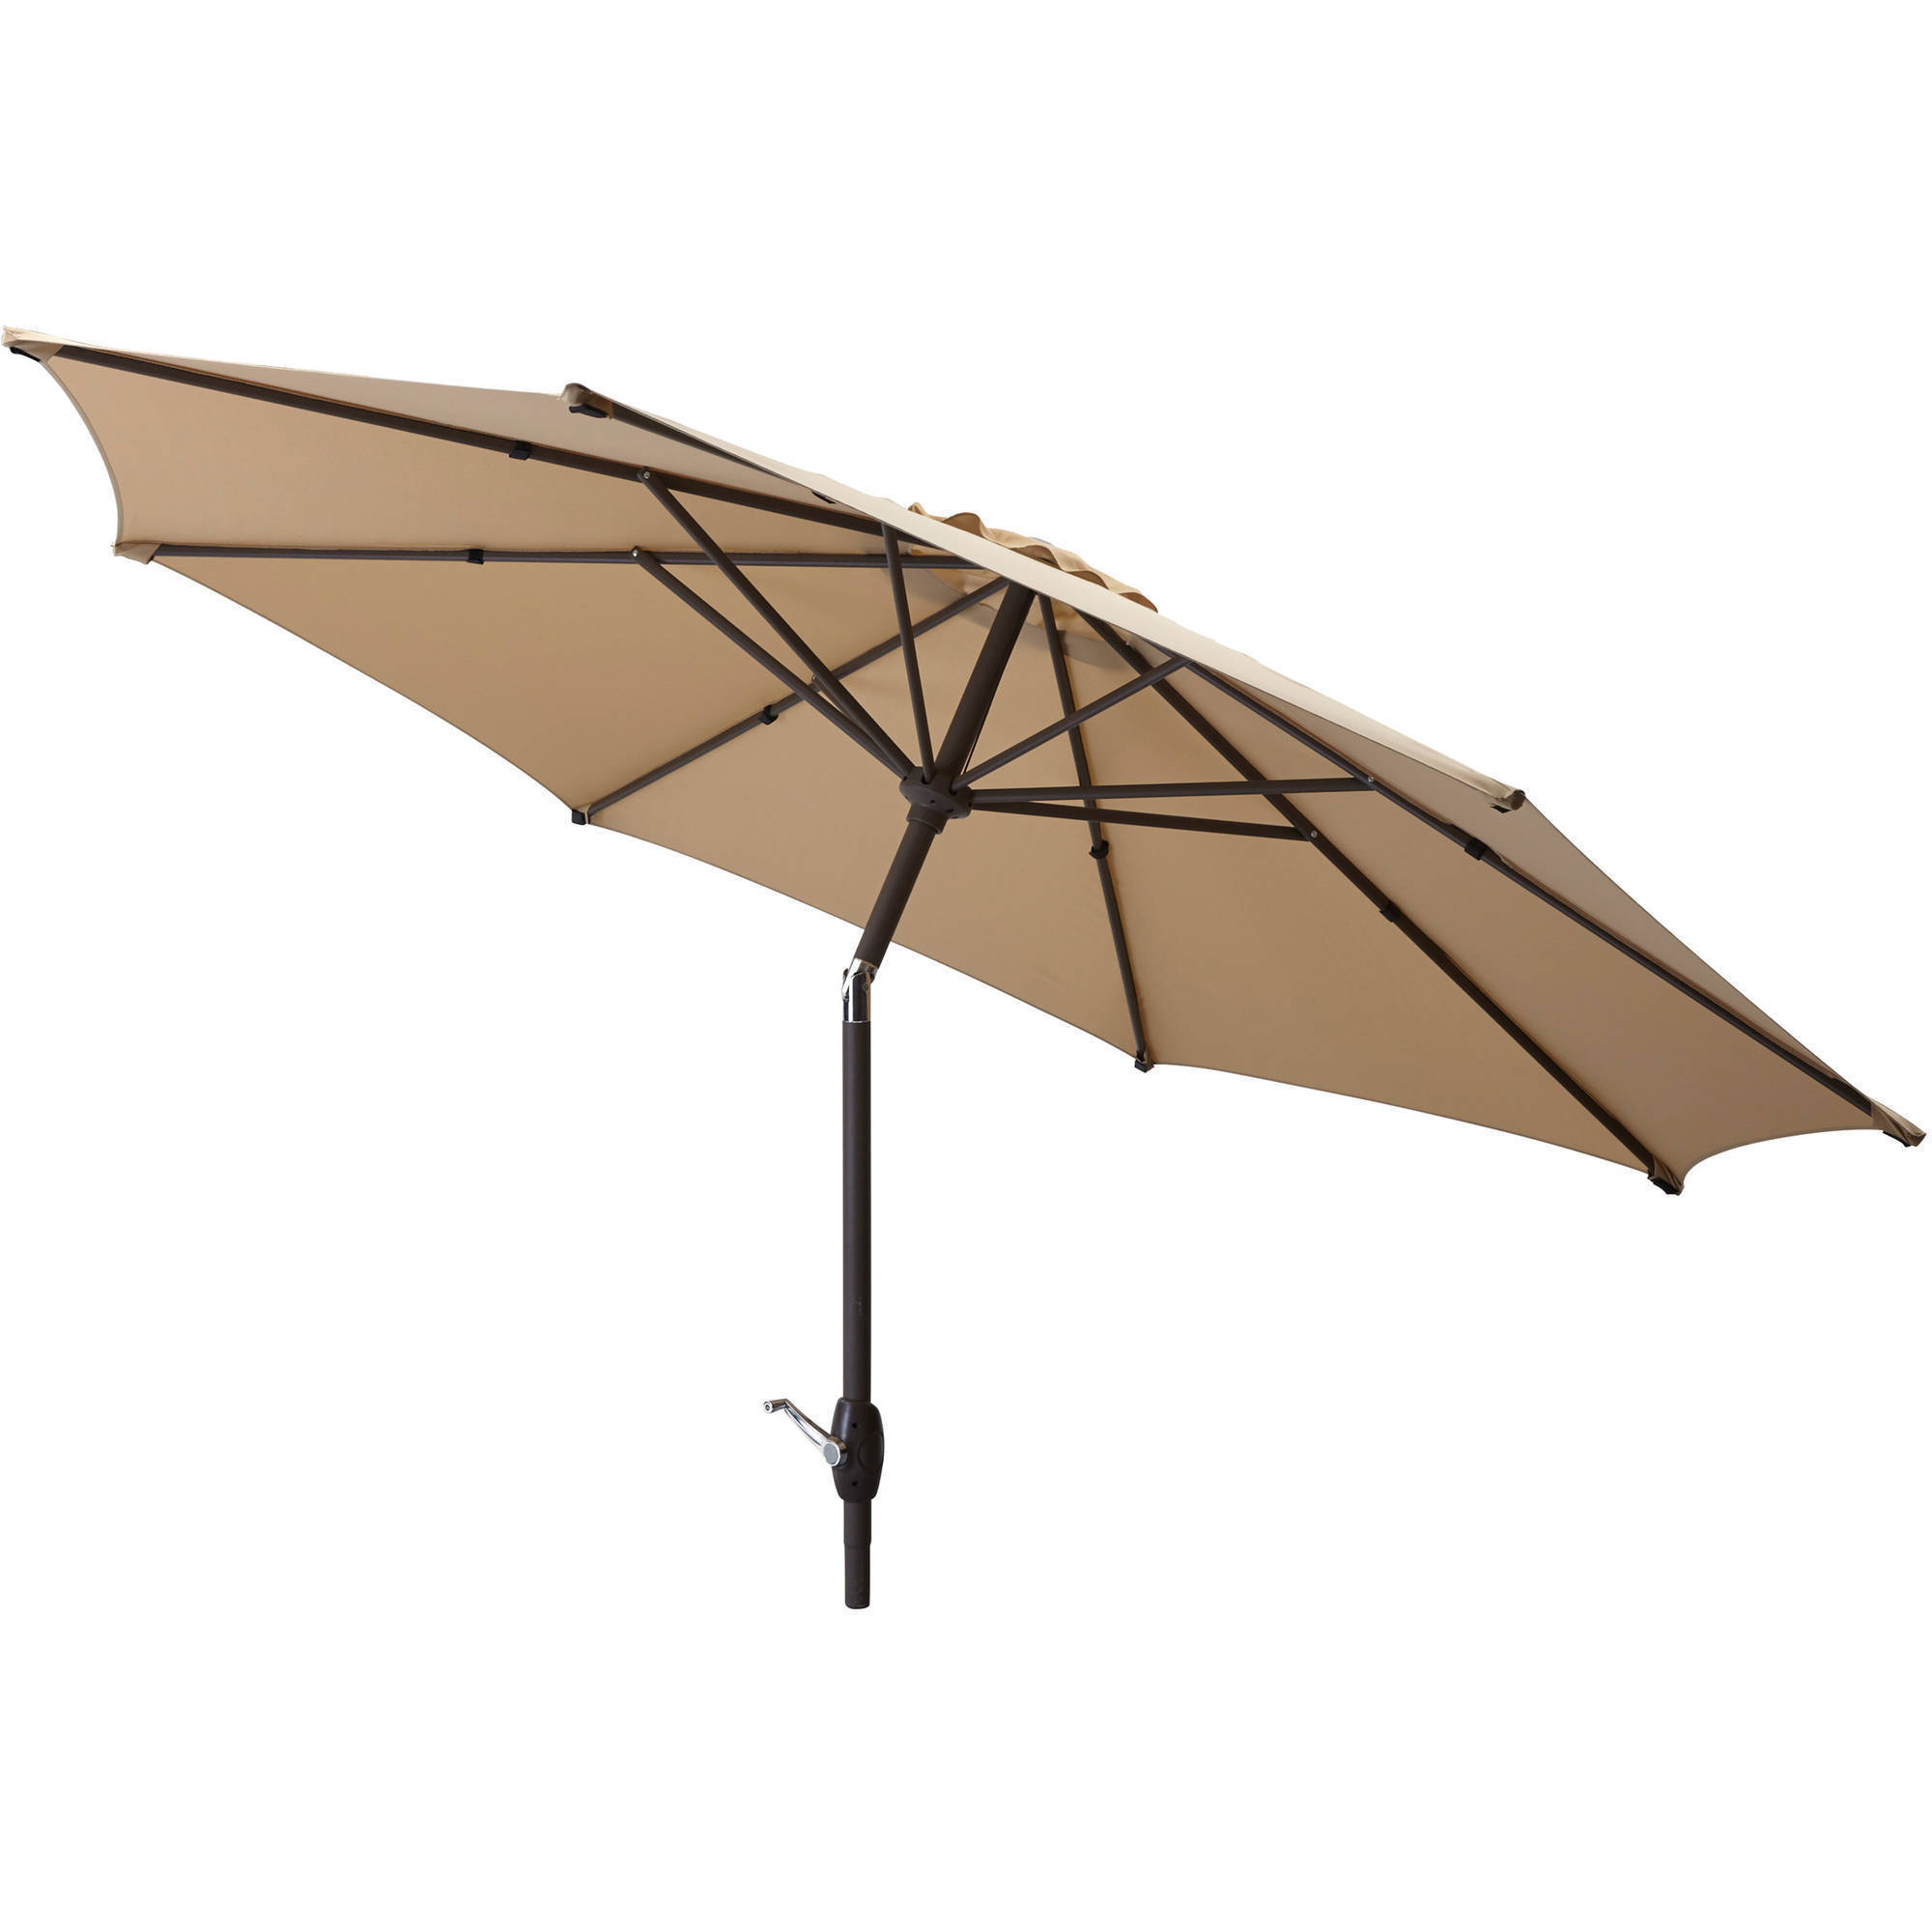 Mainstays 9' Market Umbrella by NINGBO EVERLUCK